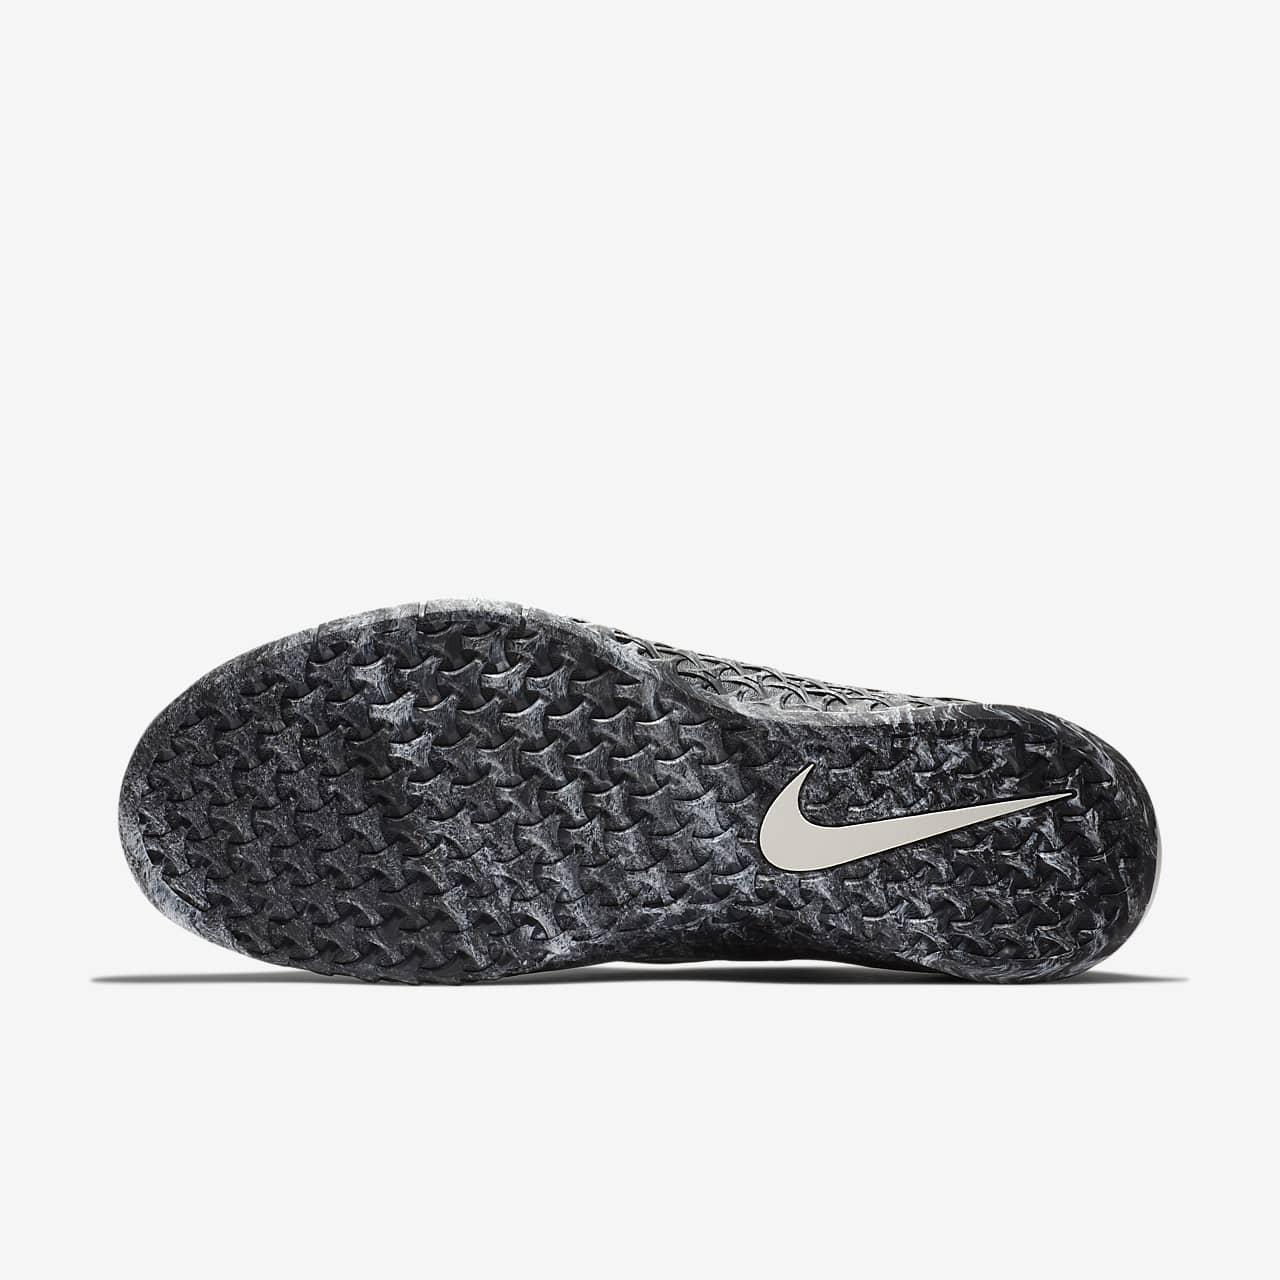 Nike Metcon 4 Men's Cross Training/Weightlifting Shoe